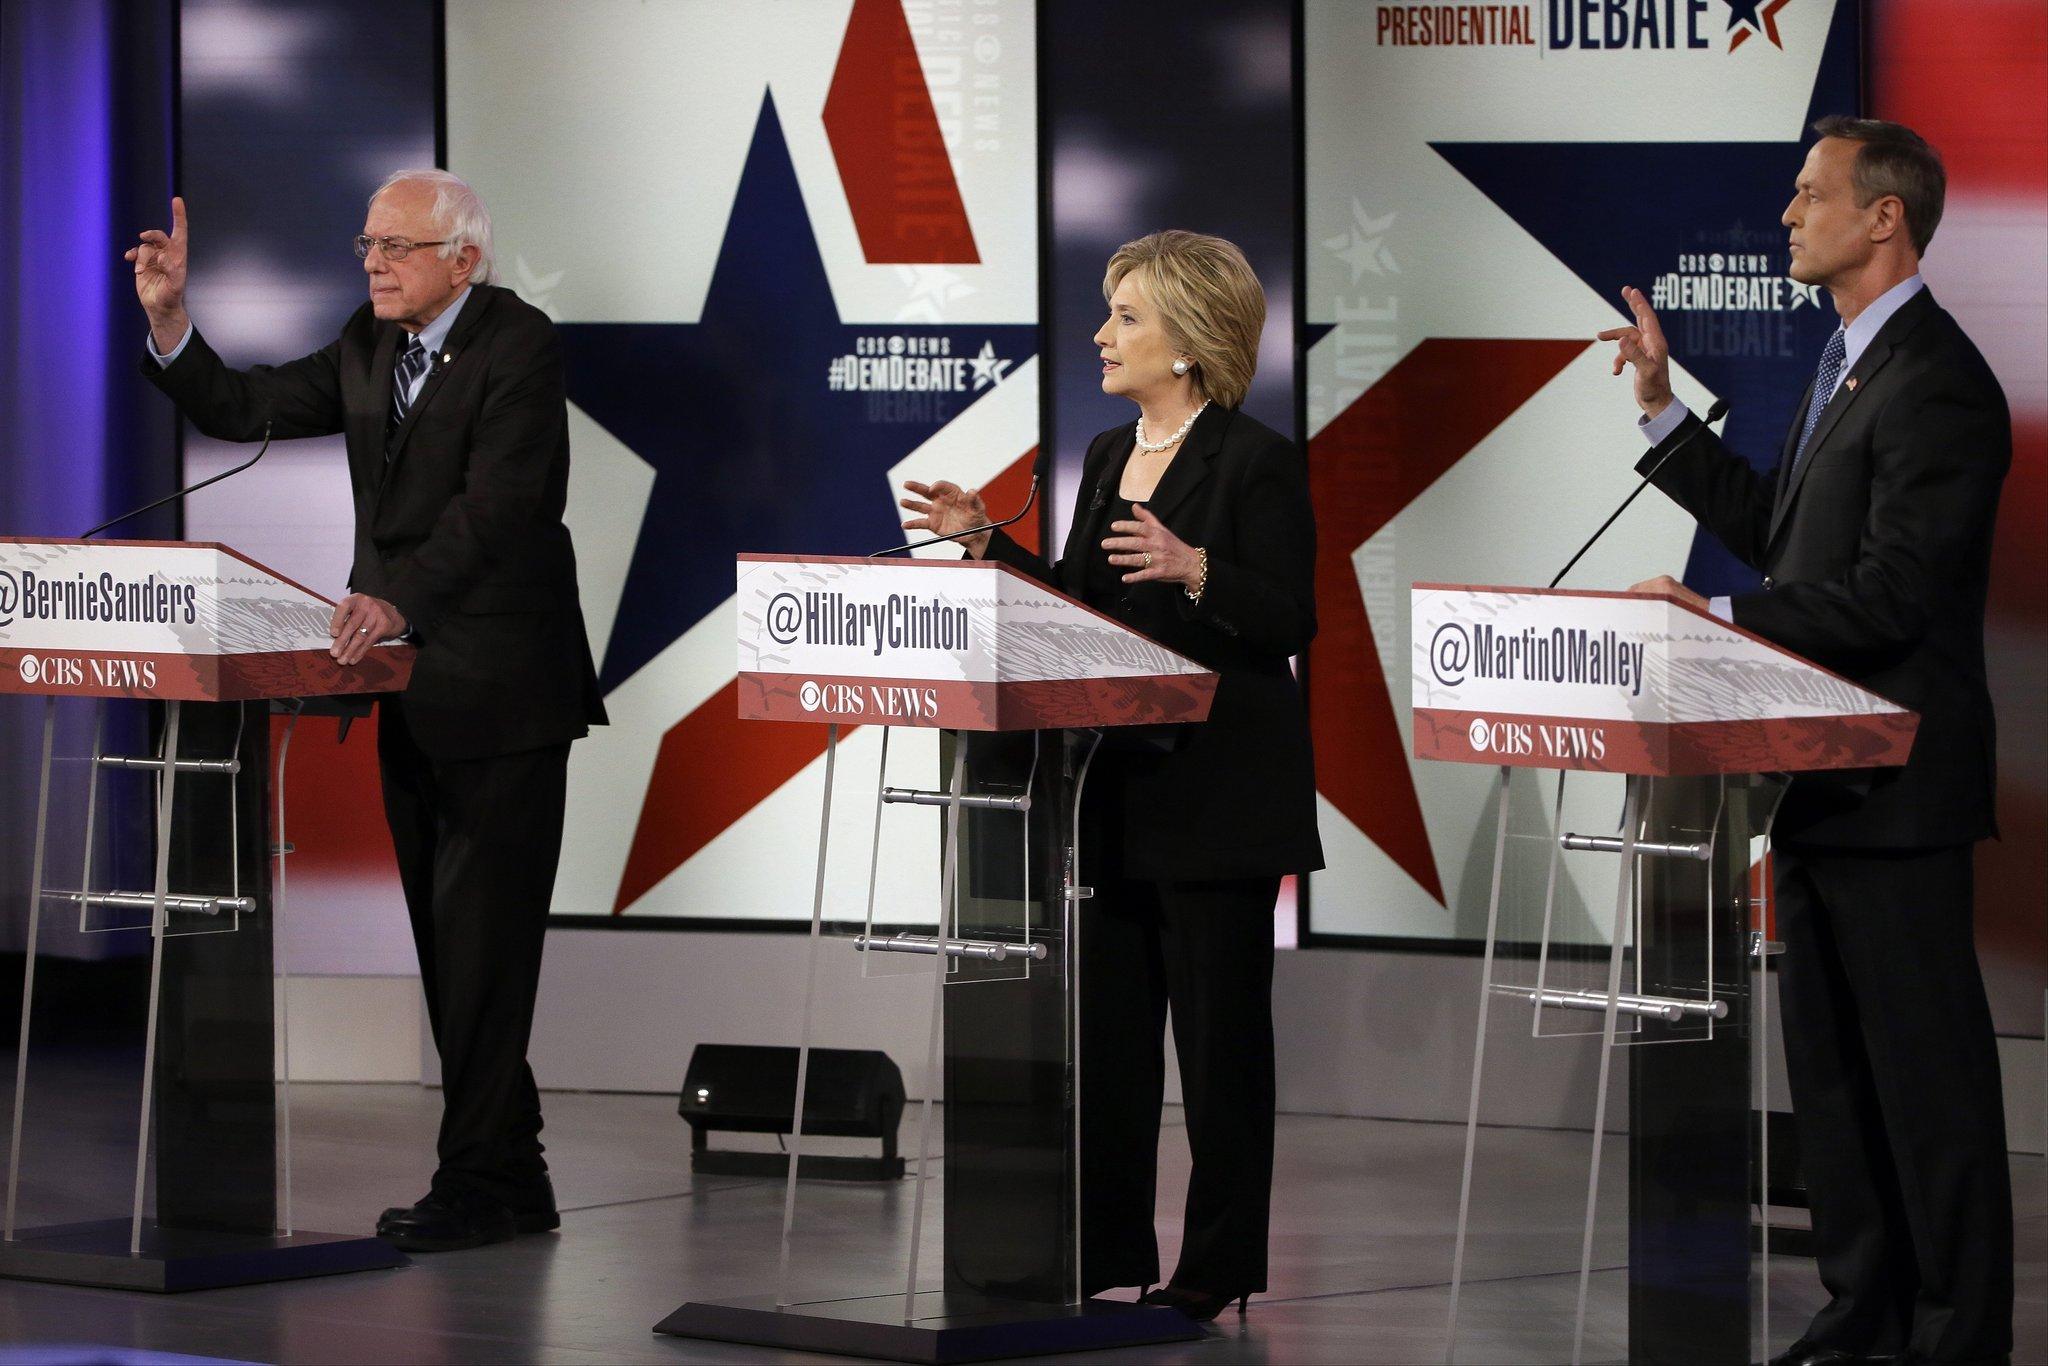 Bernie Sanders, Hillary Clinton and Martin O'Malley at a Democratic presidential debate in November. (Charlie Neibergall / Associated Press)